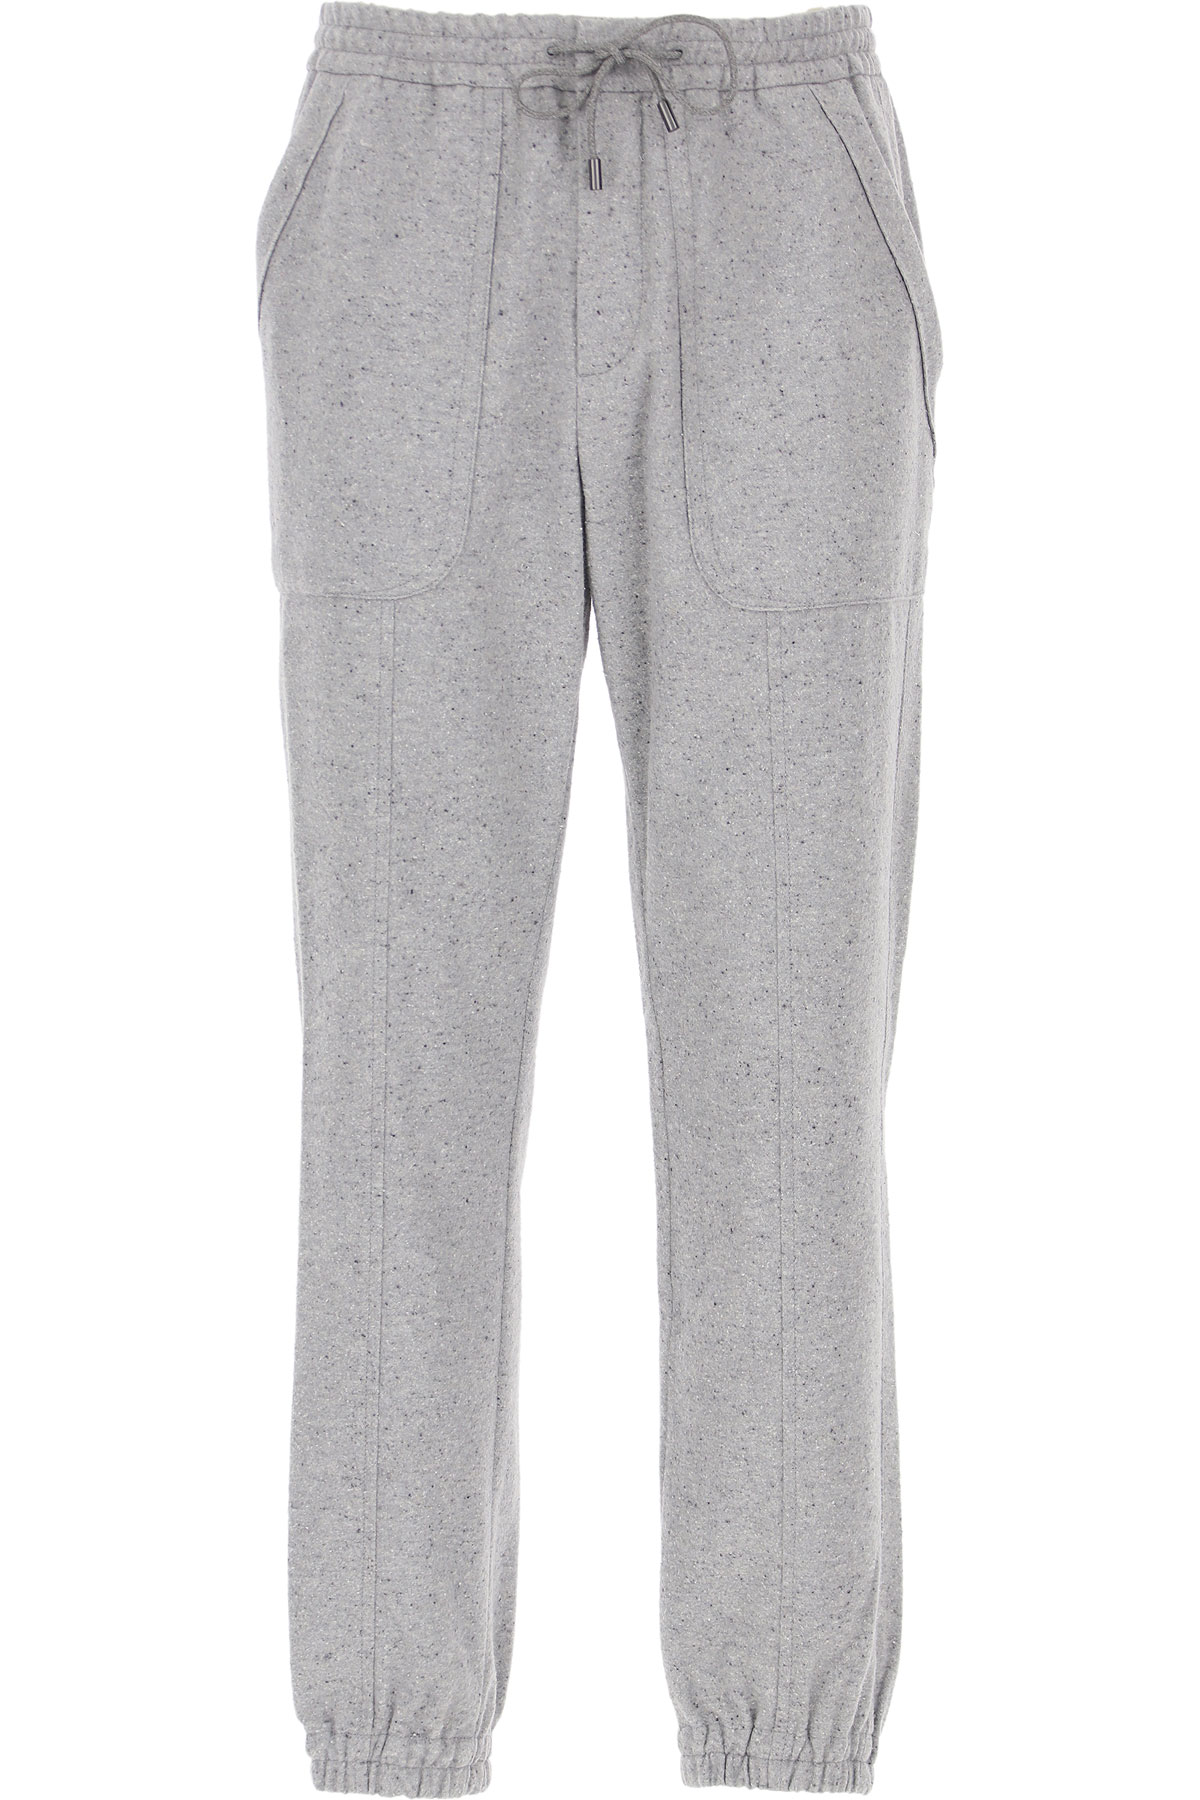 Ermenegildo Zegna Pants For Men, Grey, Cotton, 2021, 30 34